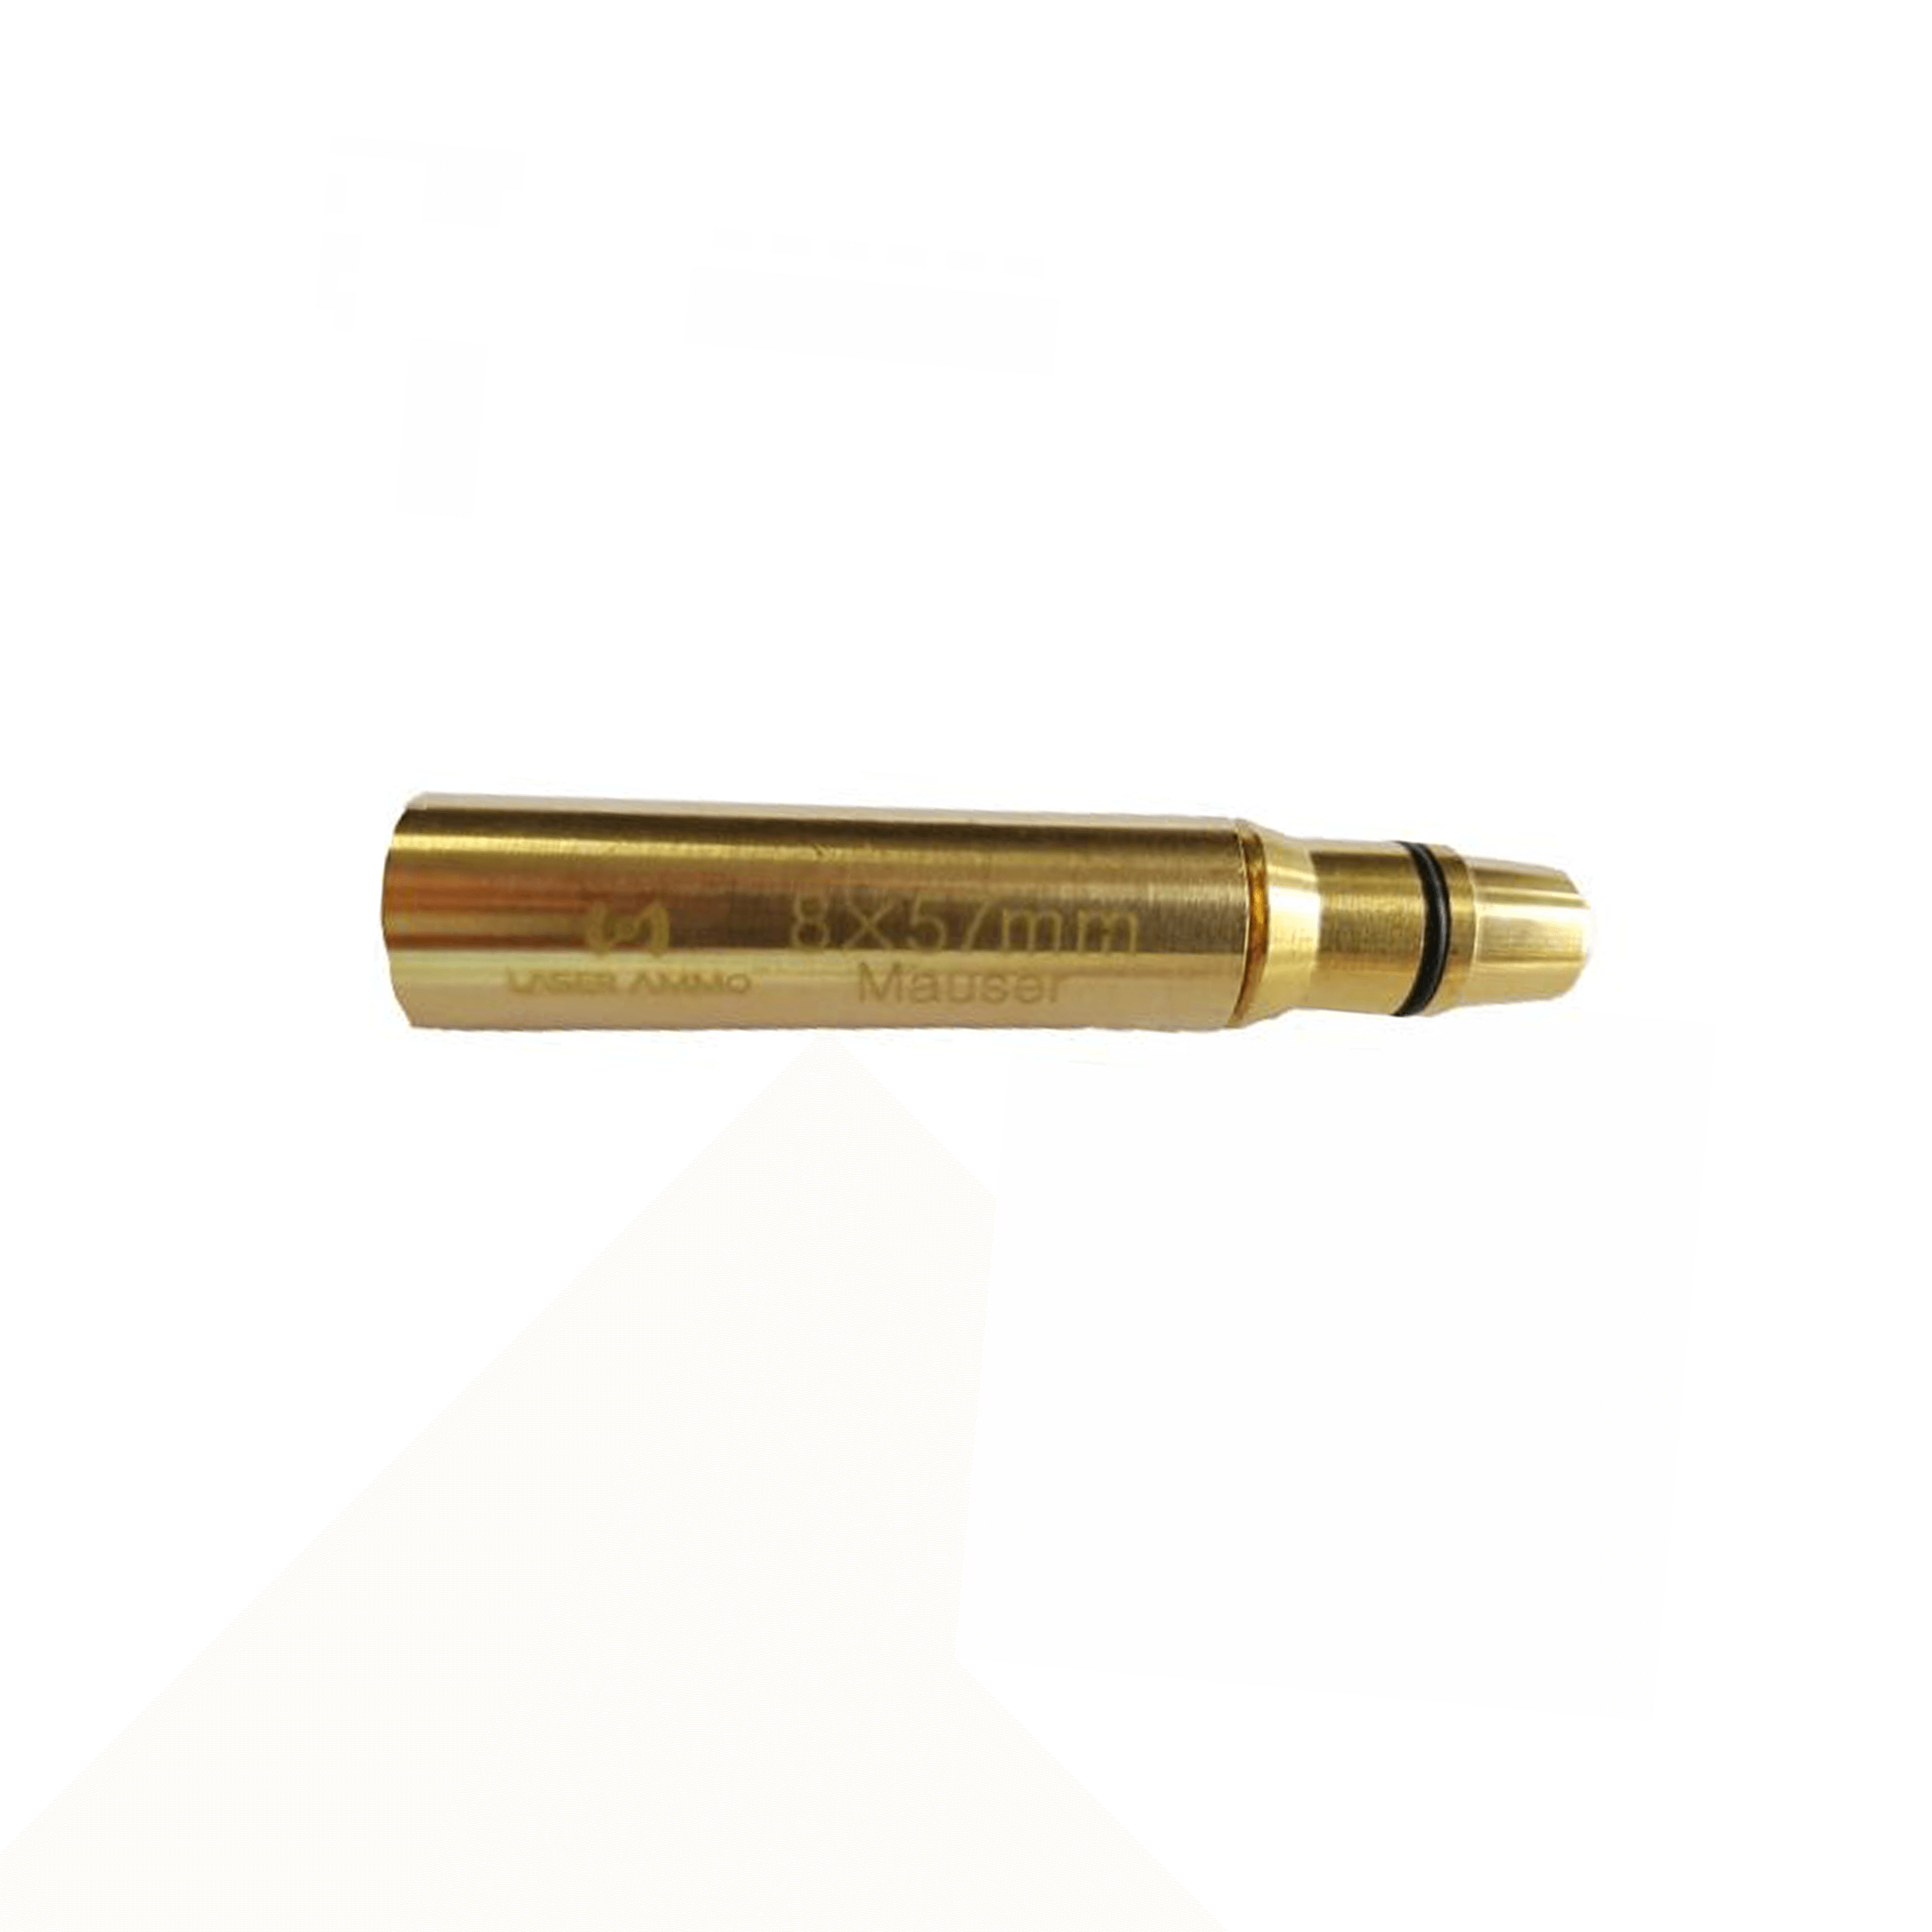 8x57 IS - SureStrike 8X57 Mauser Adapter Sleeve - 8X57MAR